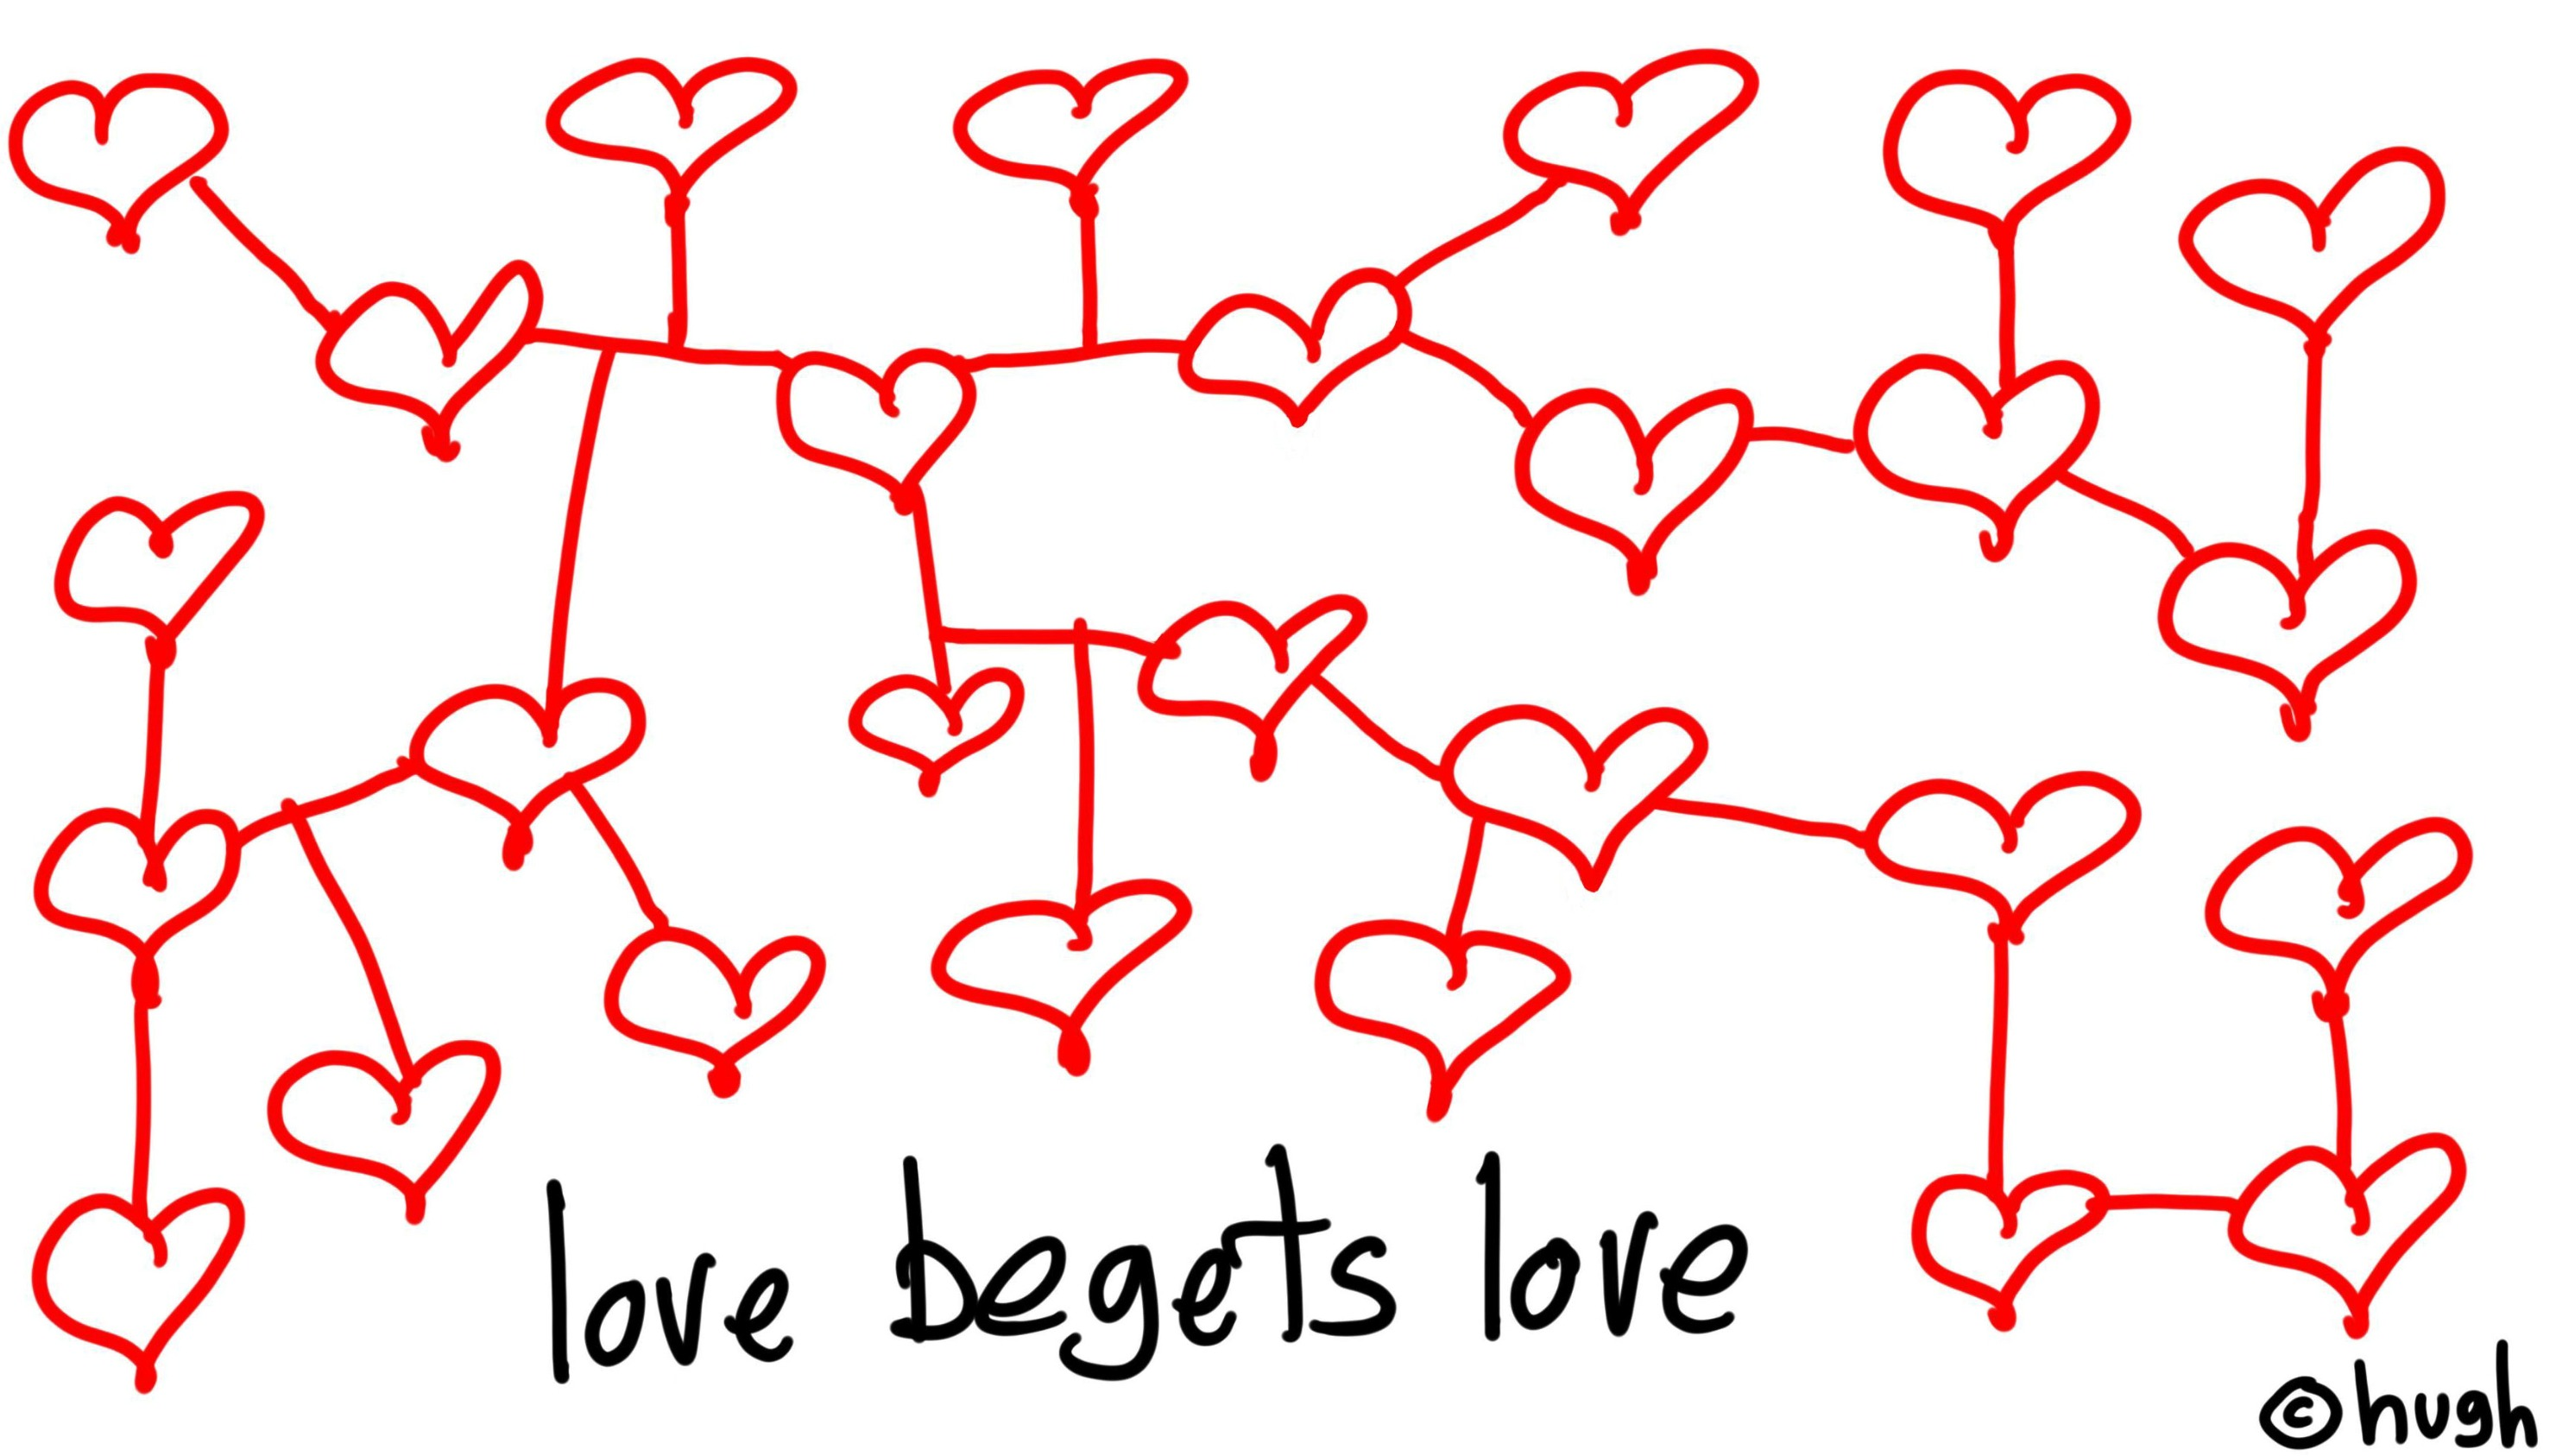 lovebegets25 NO2